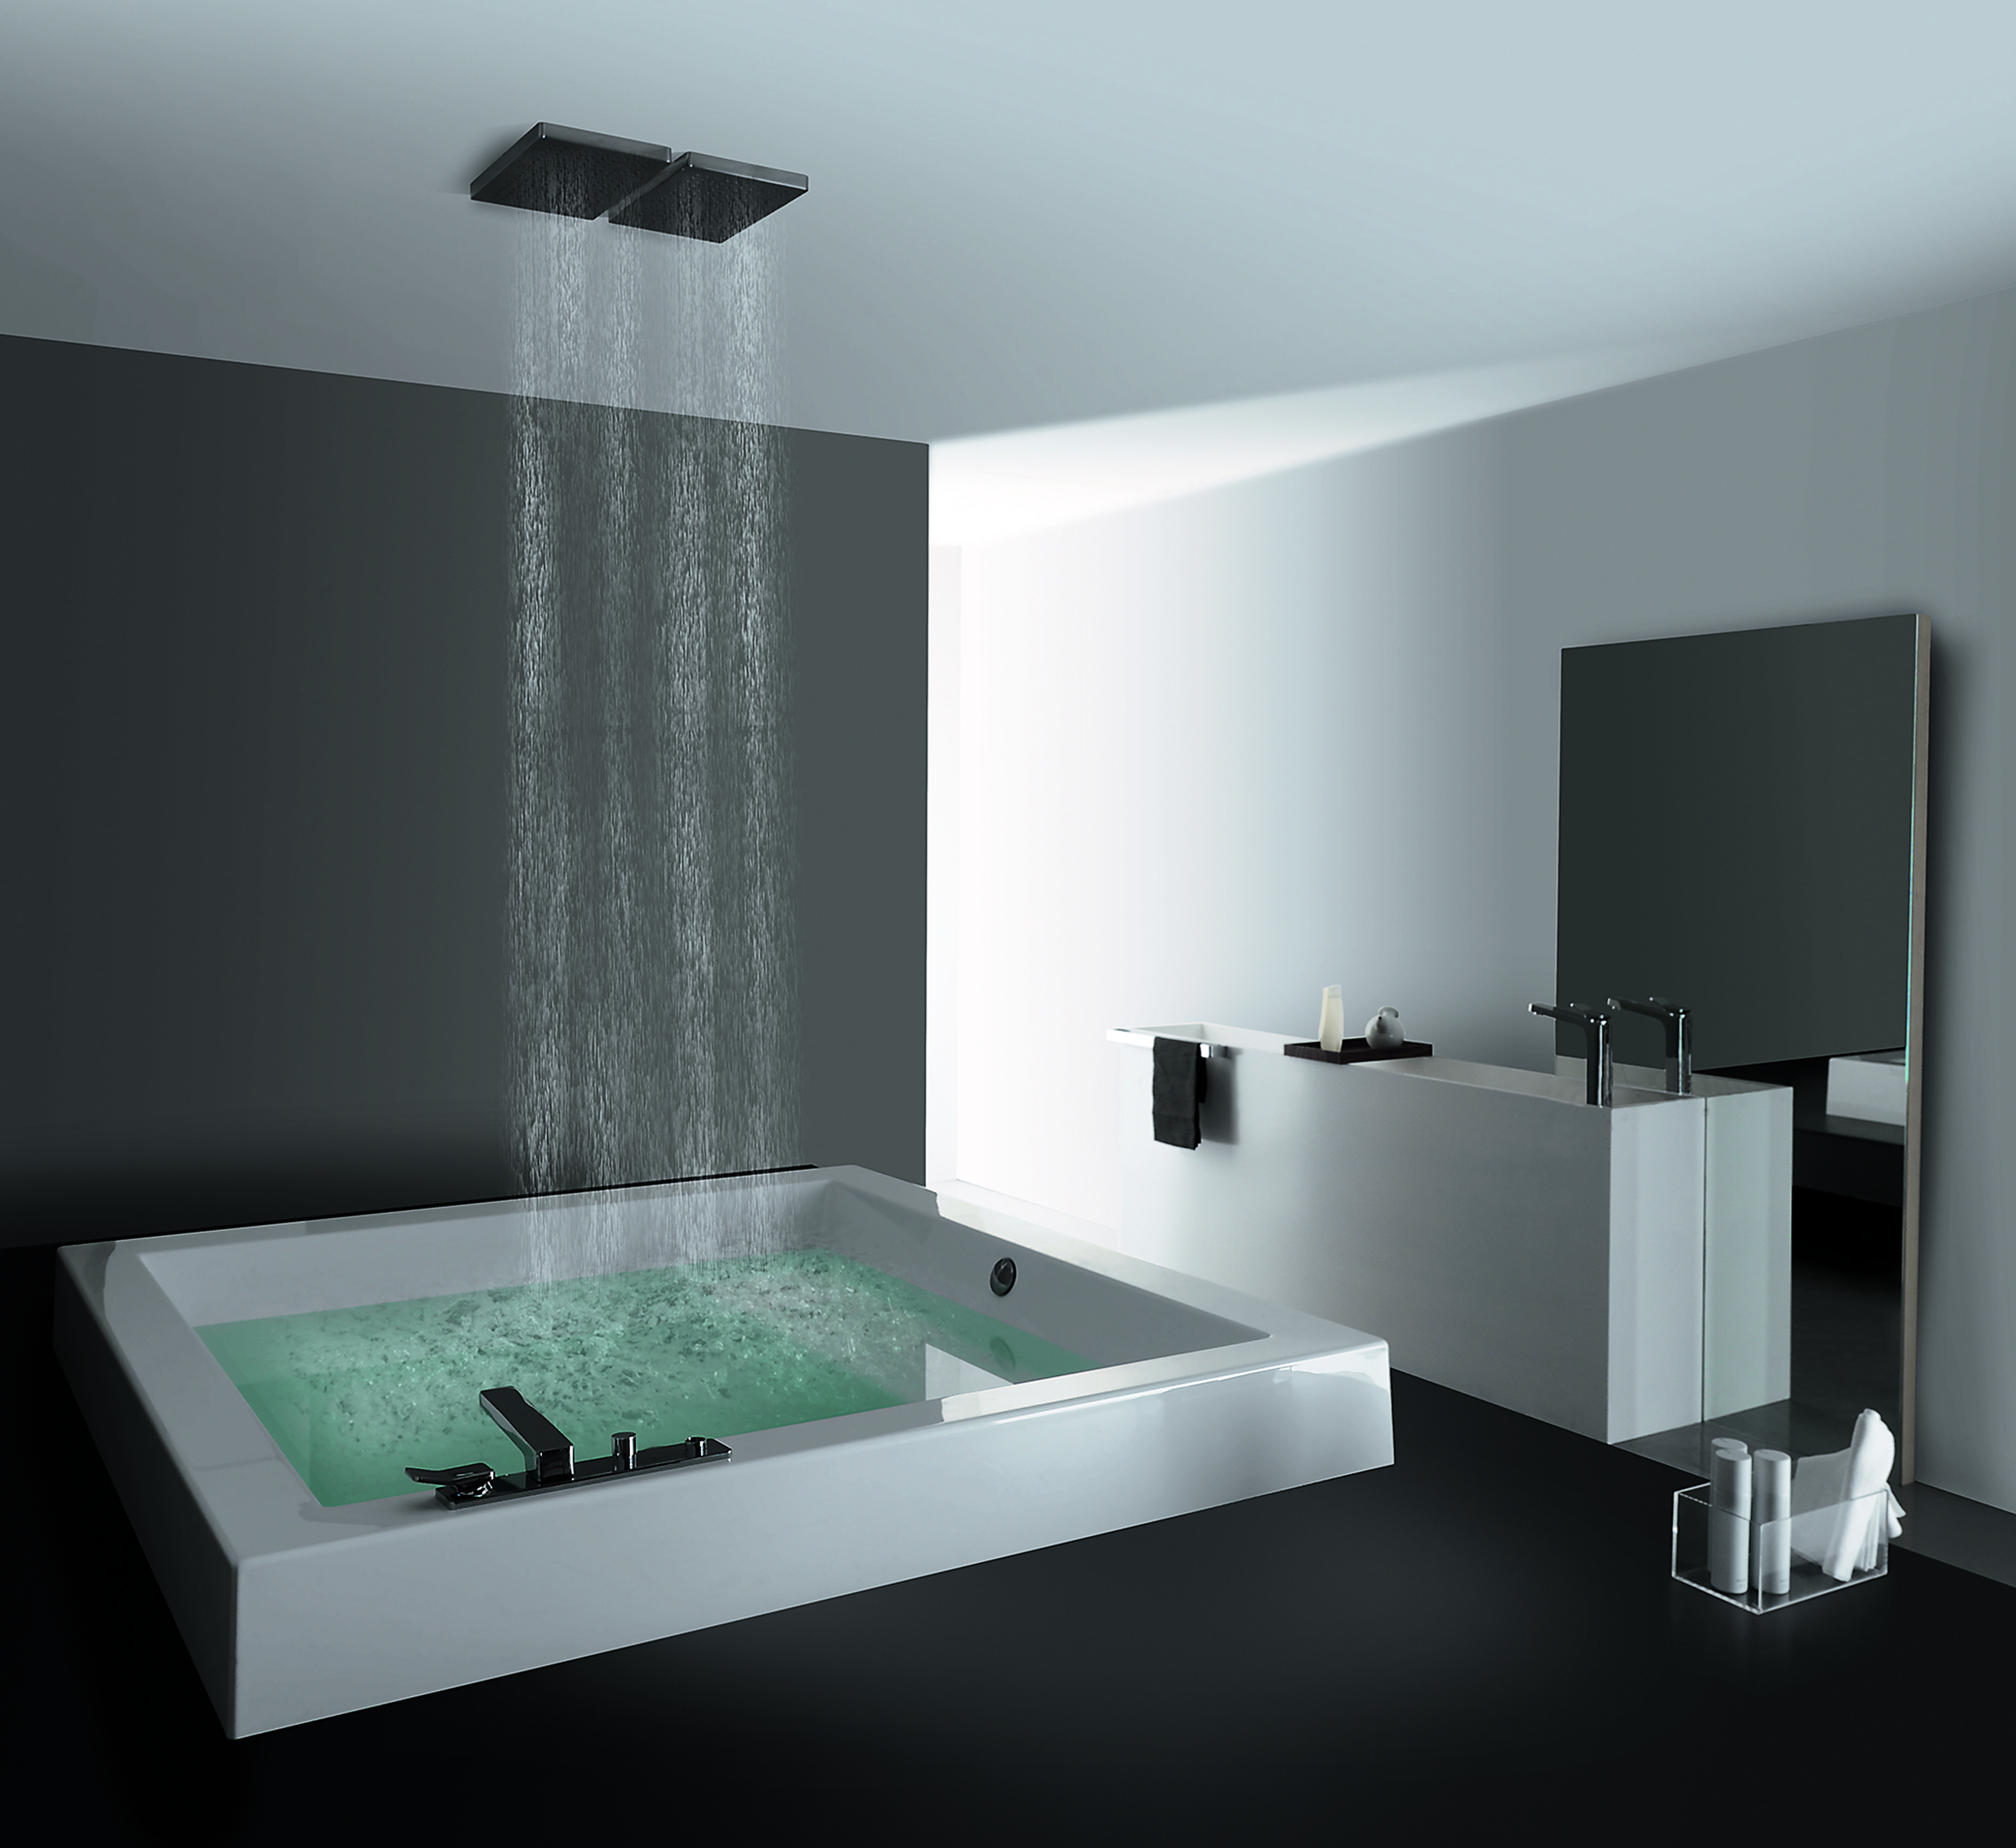 Zucchetti.Kos Grande Step Quadra bath tub   BATHROOM COMFORT ...